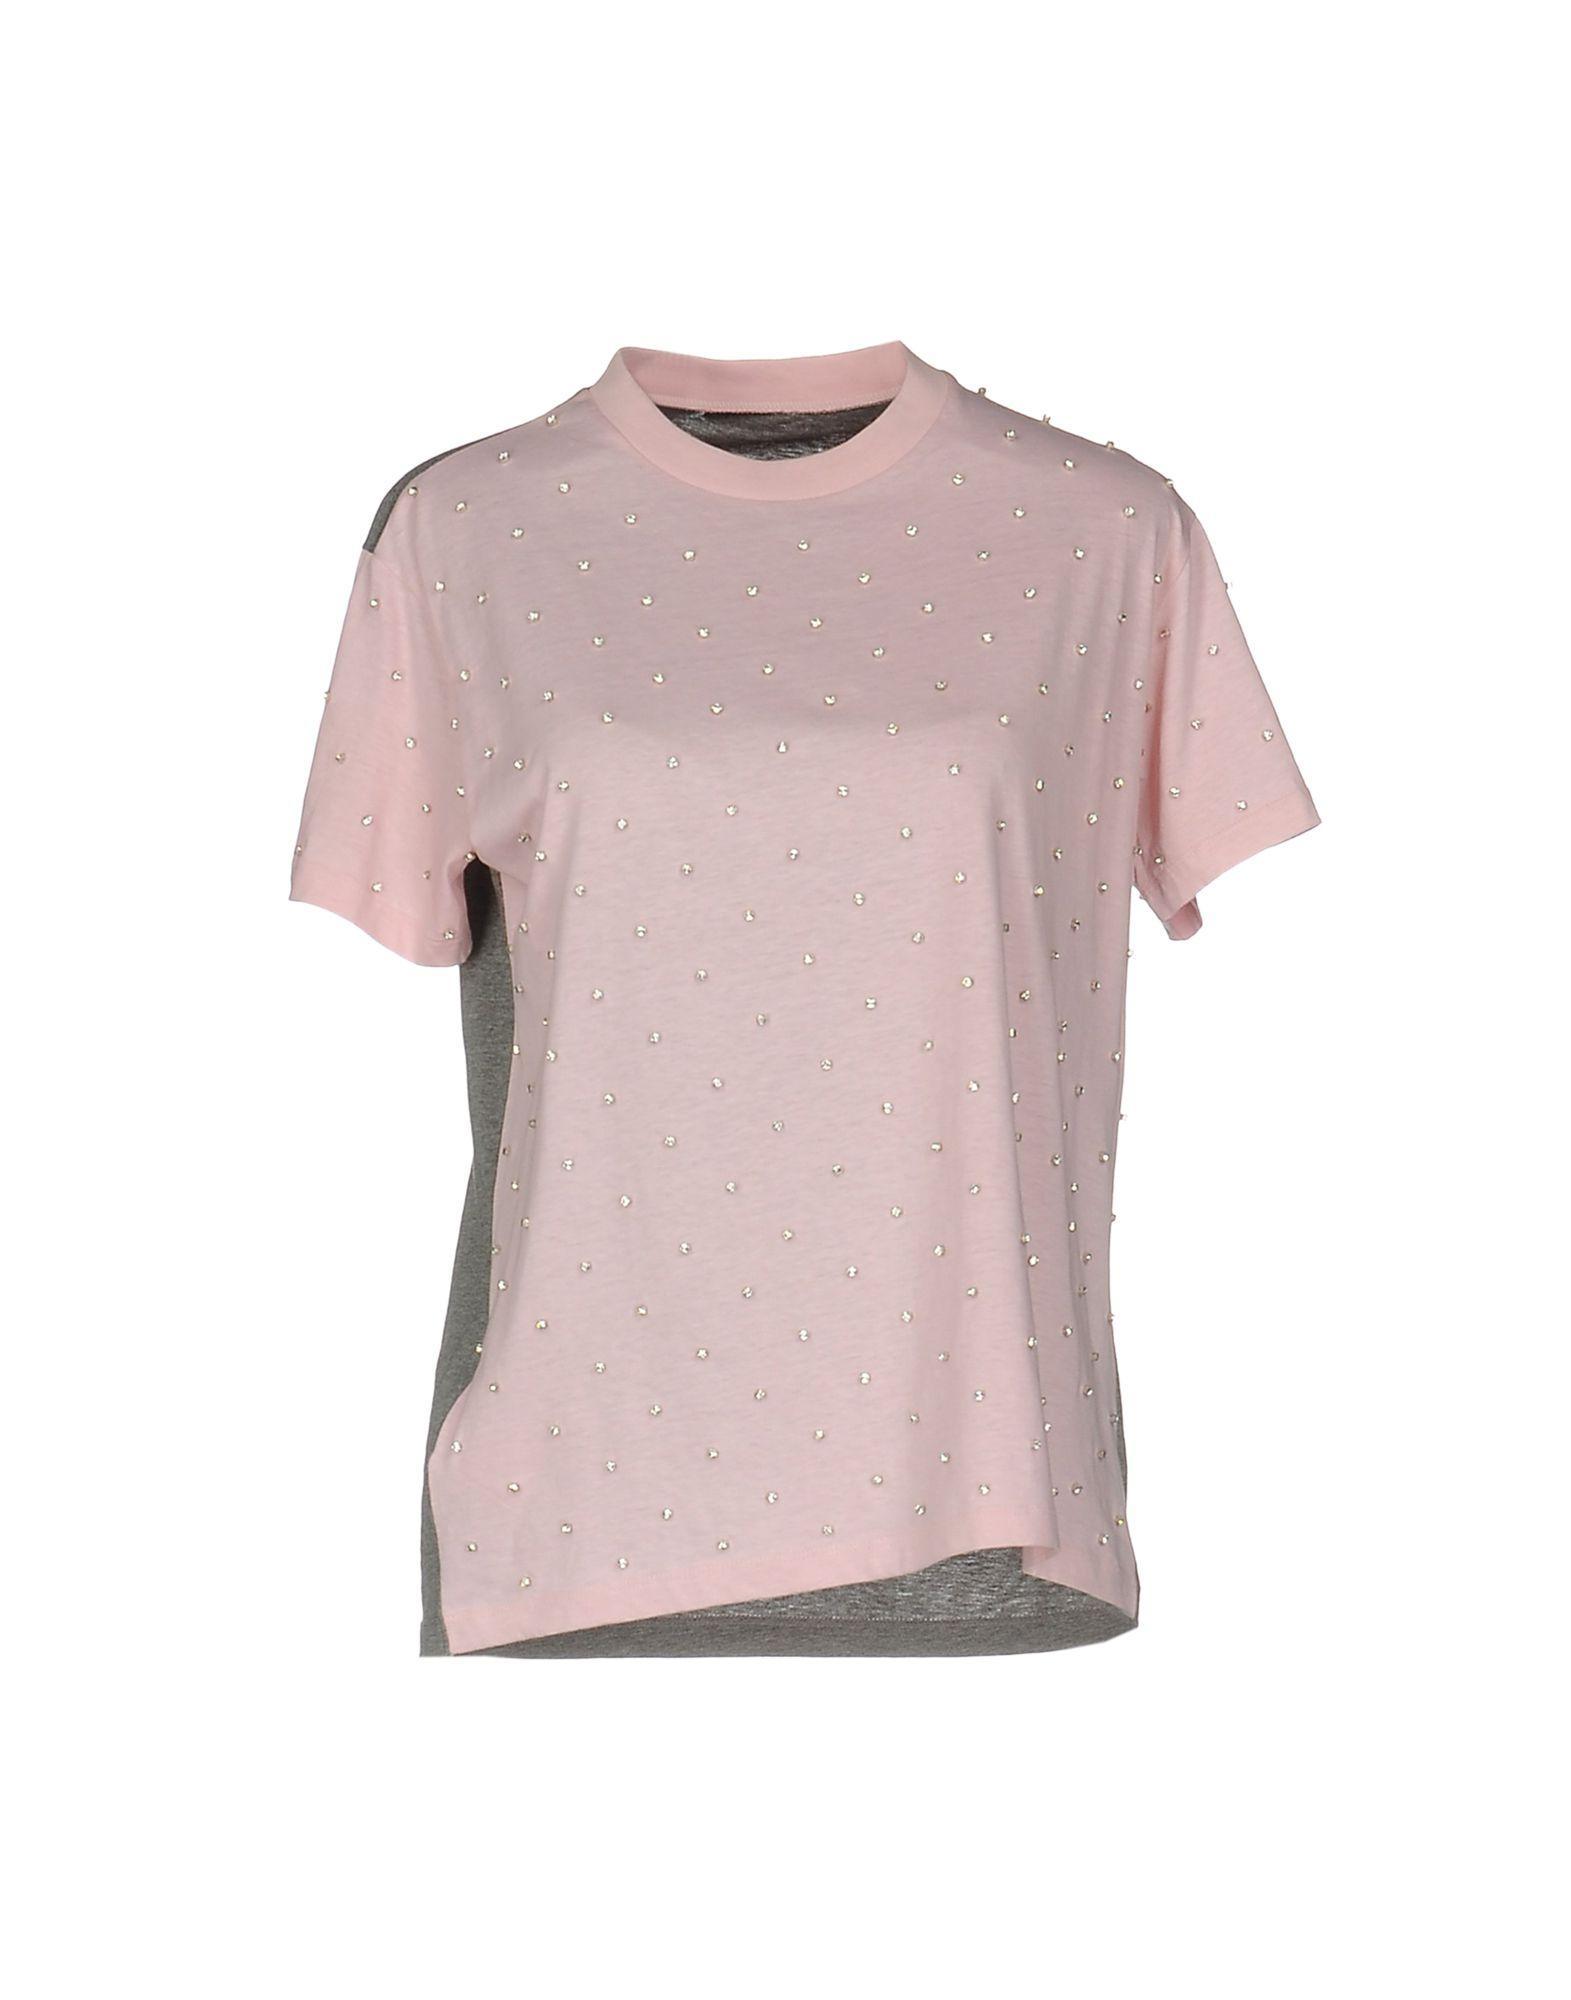 Lyst miu miu t shirt in pink for Miu miu t shirt